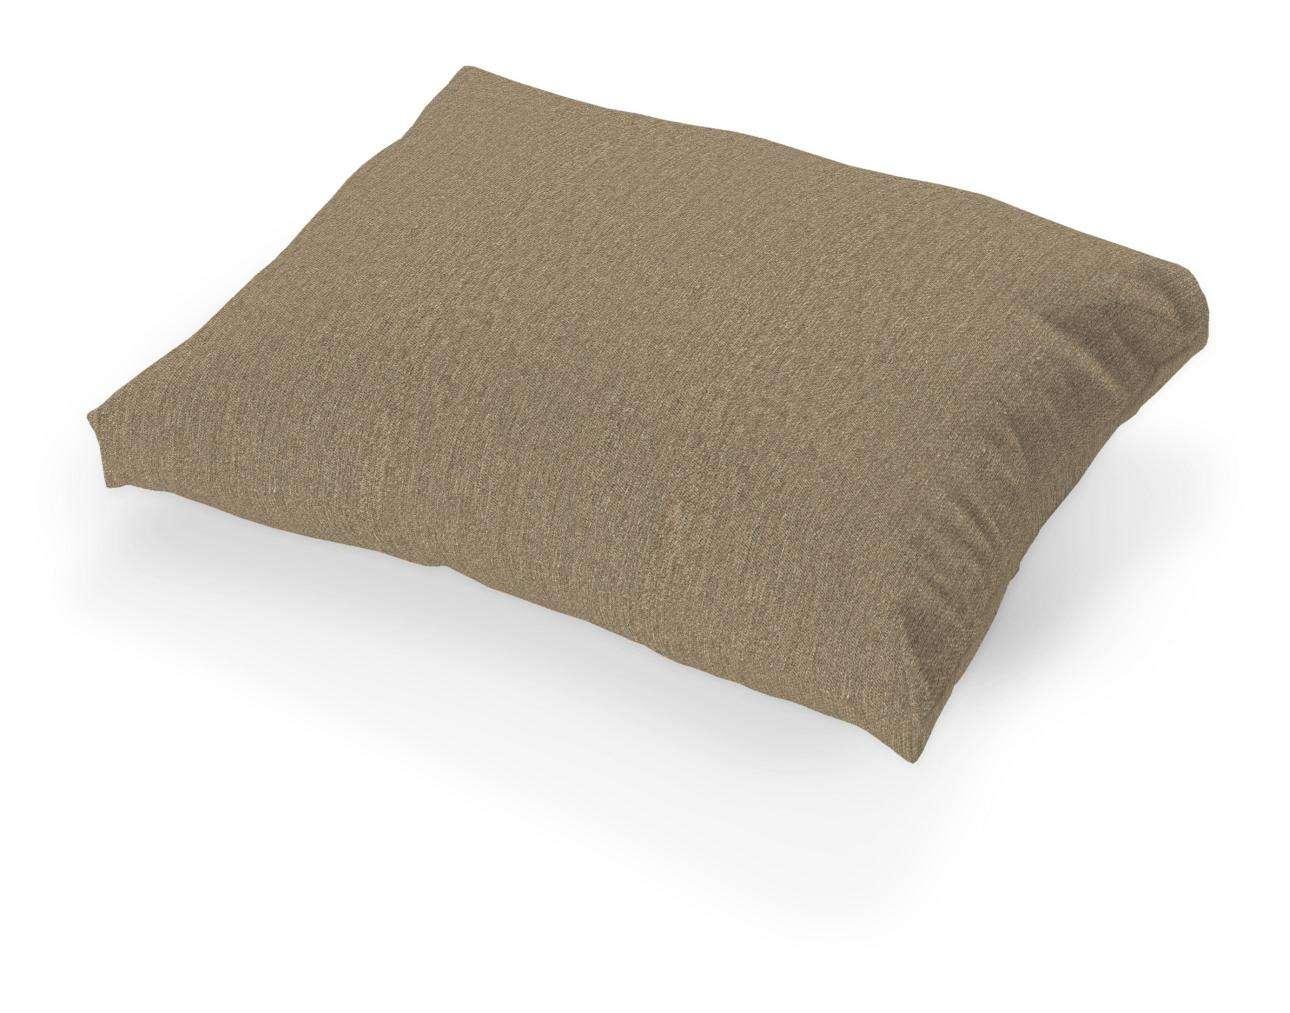 Tylösand pagalvėlės užvalkalas Tylösand pagalvėlė kolekcijoje Chenille, audinys: 702-21